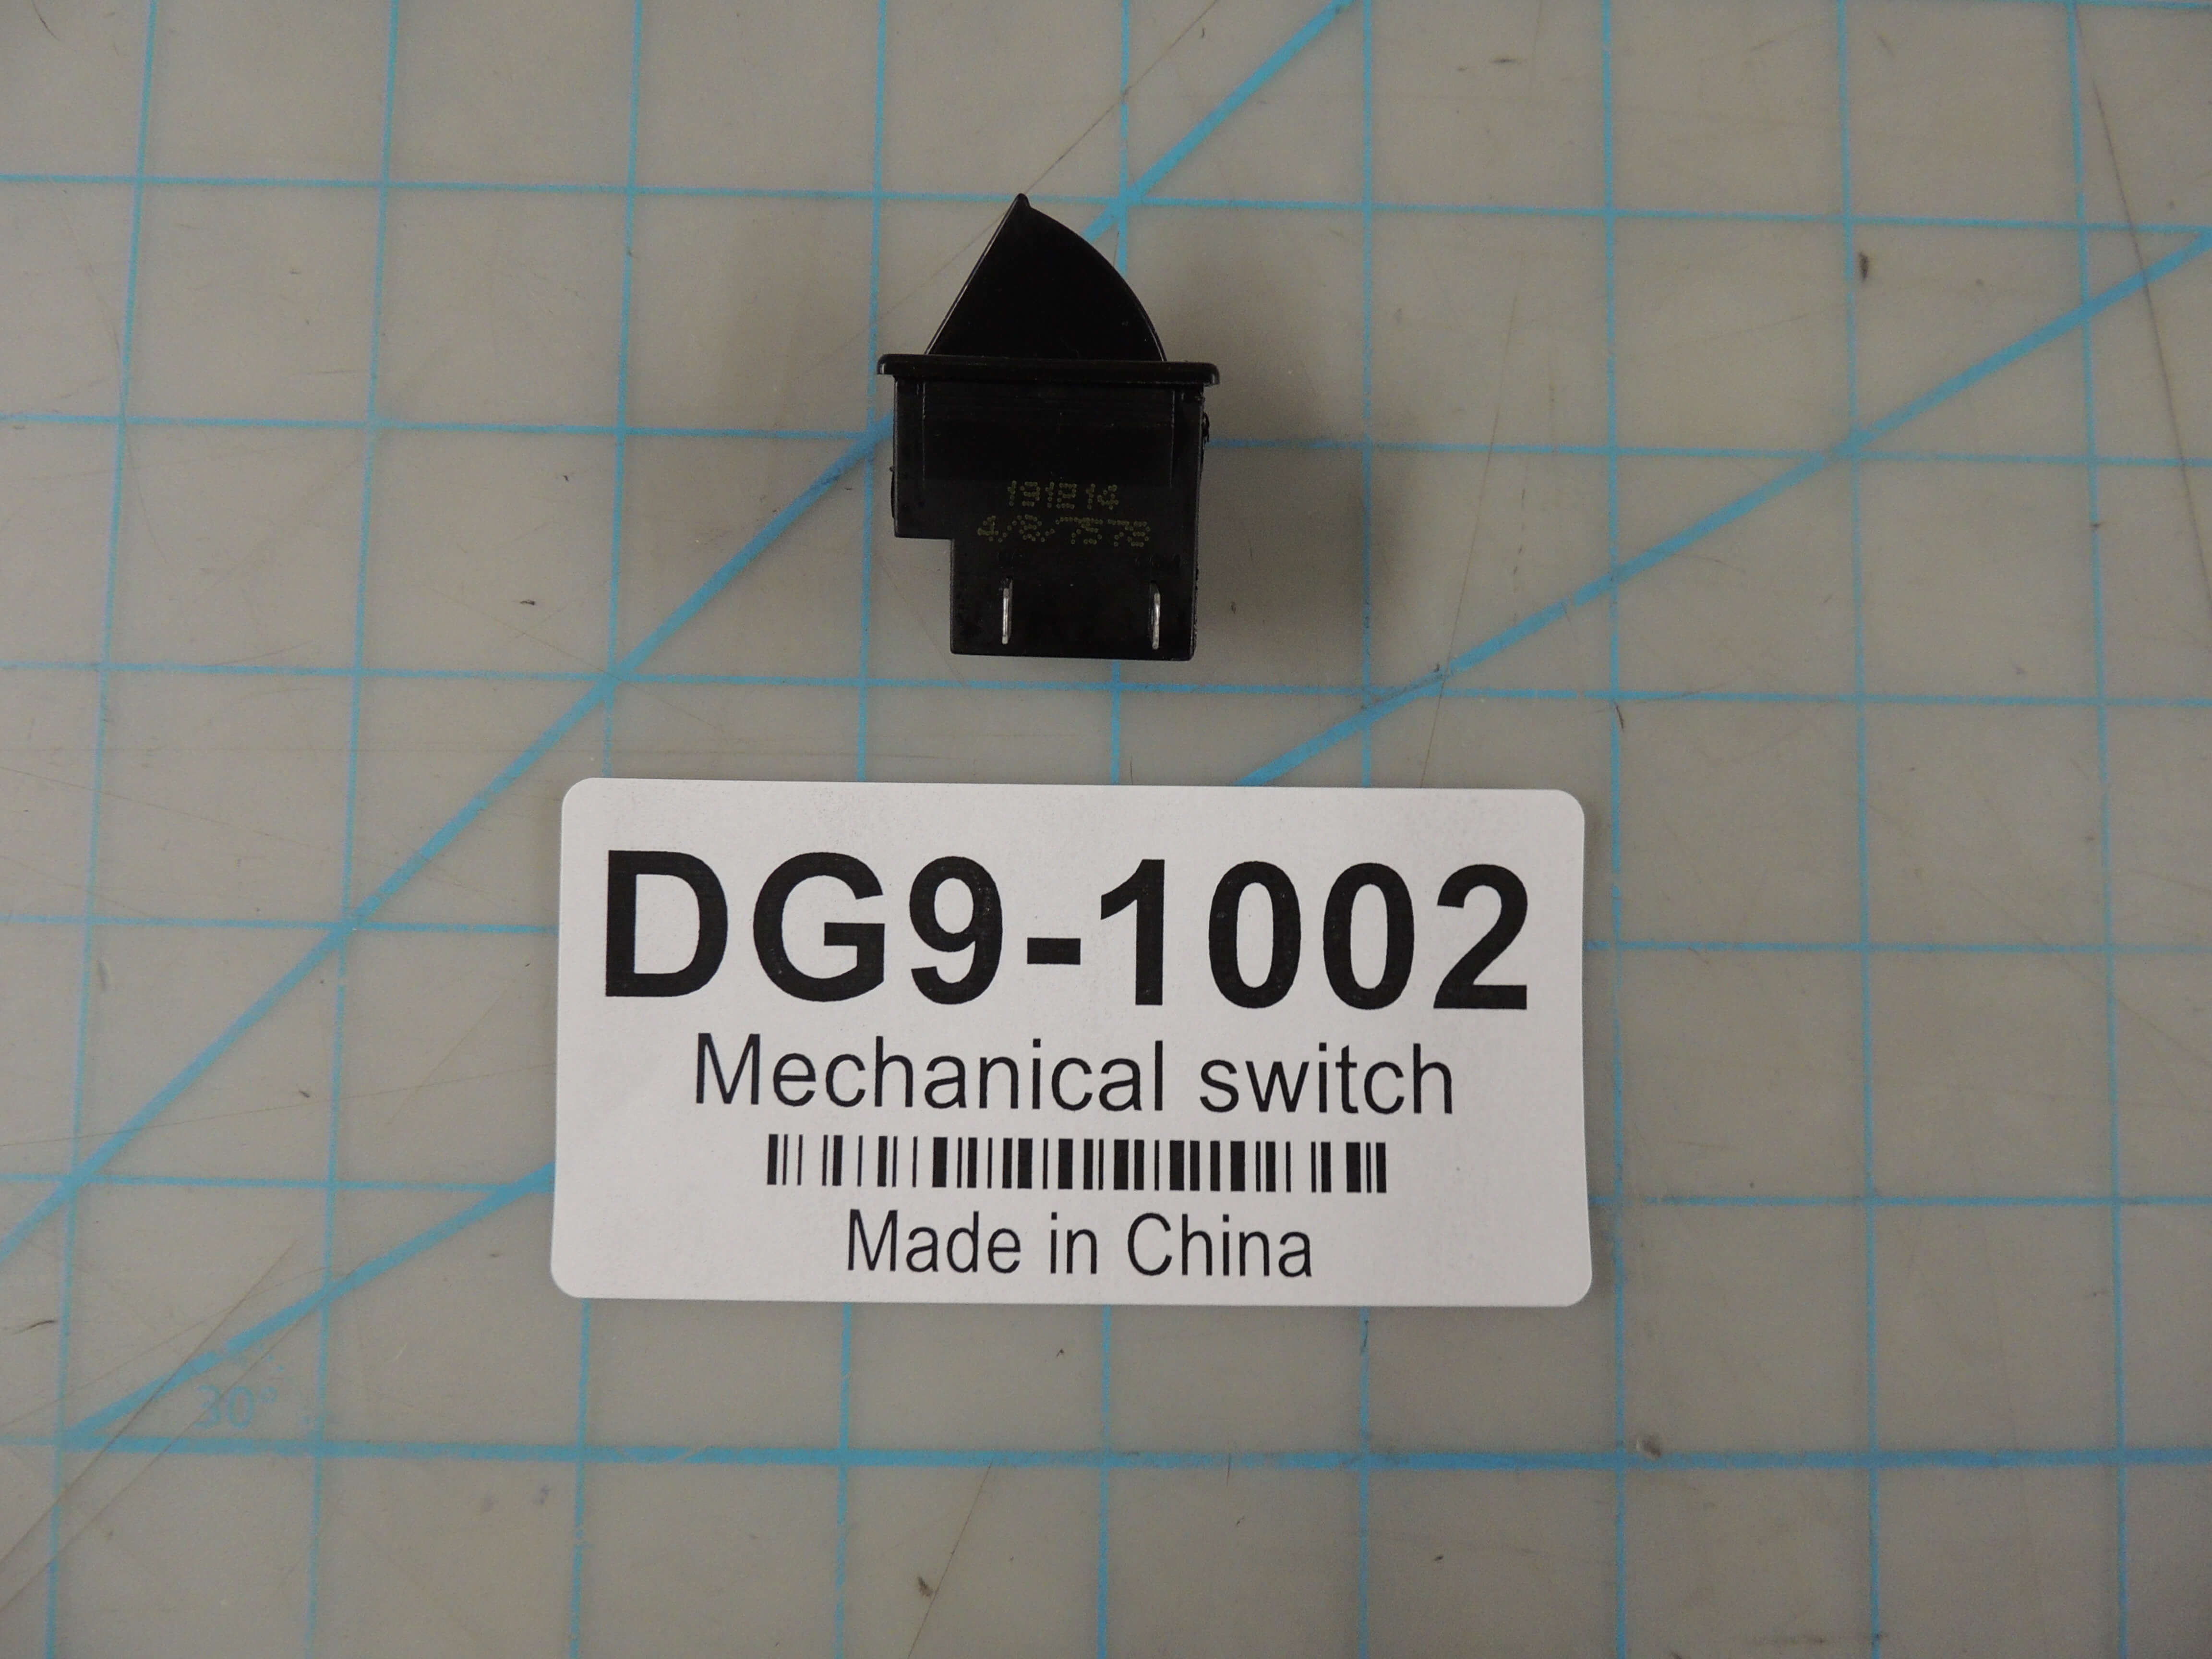 Mechanical switch